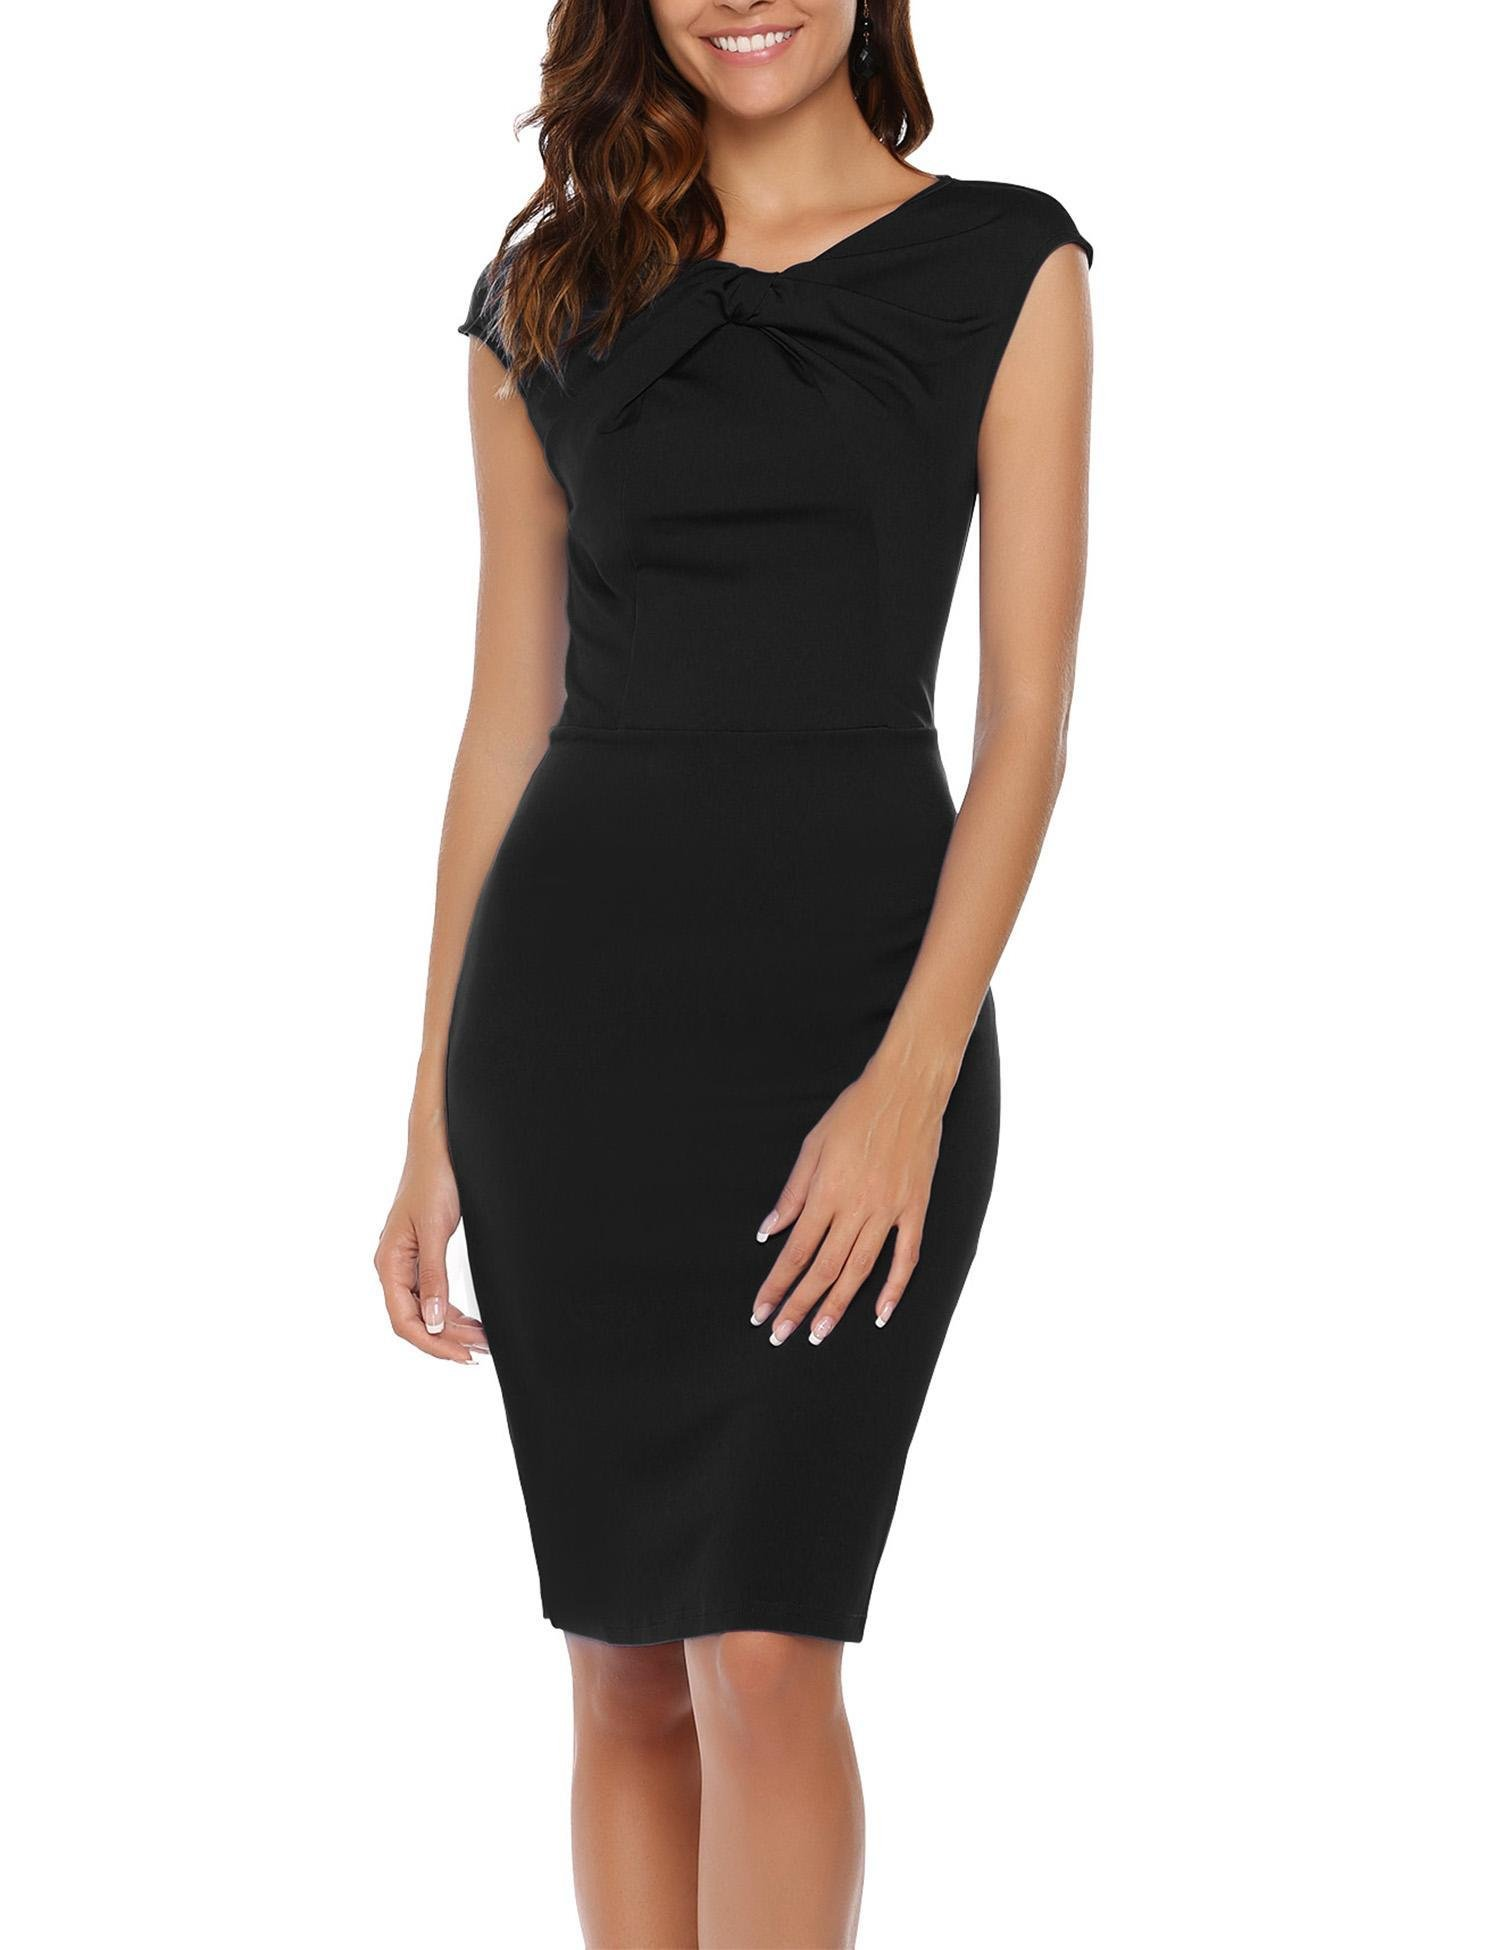 ANGVNS Womens Asymmetric Neckline Ruched Twist Wear to Work Casual Dress Black L